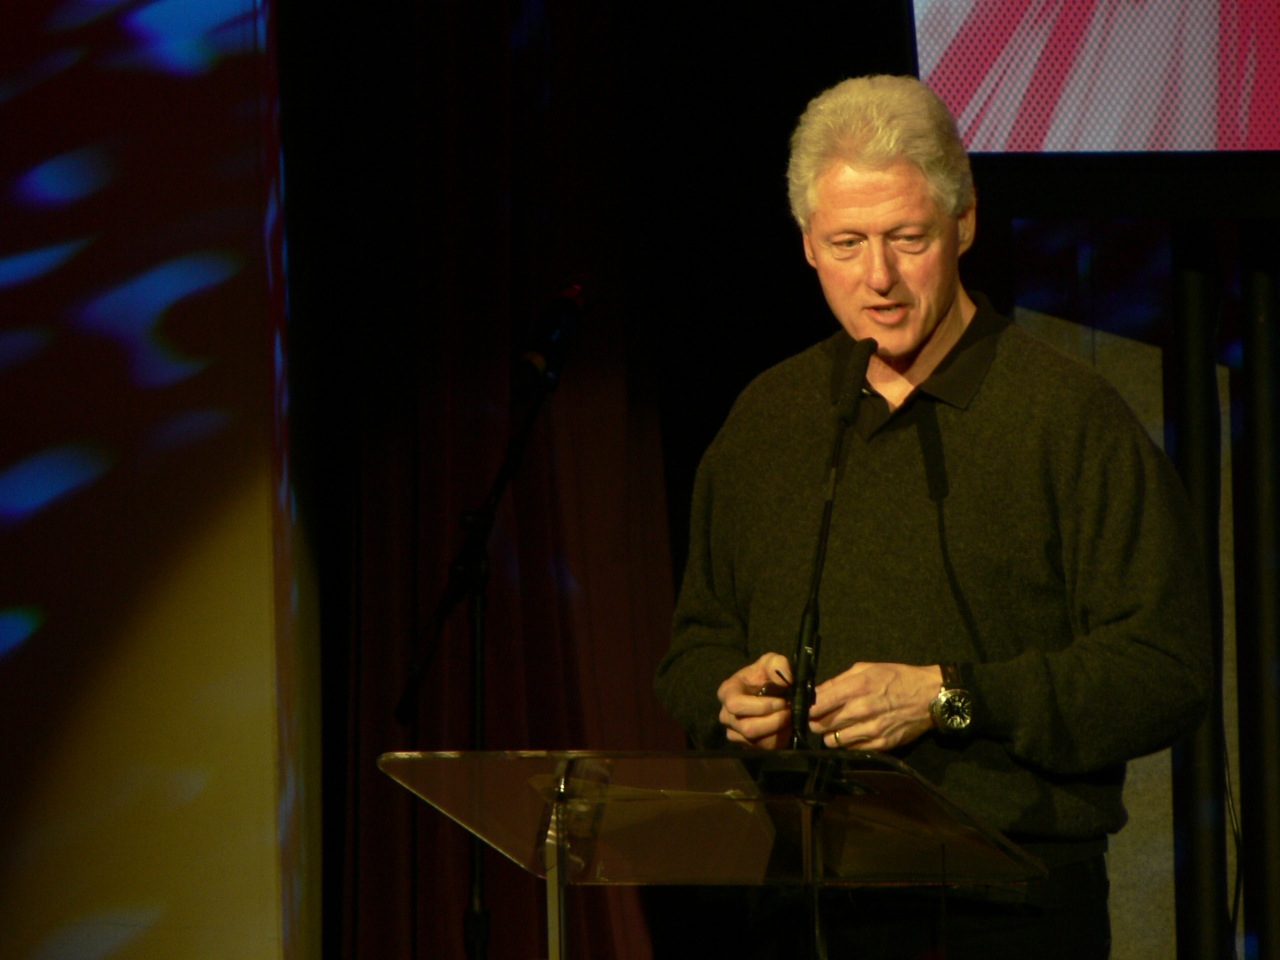 Bill Clinton addresses TED, 2007